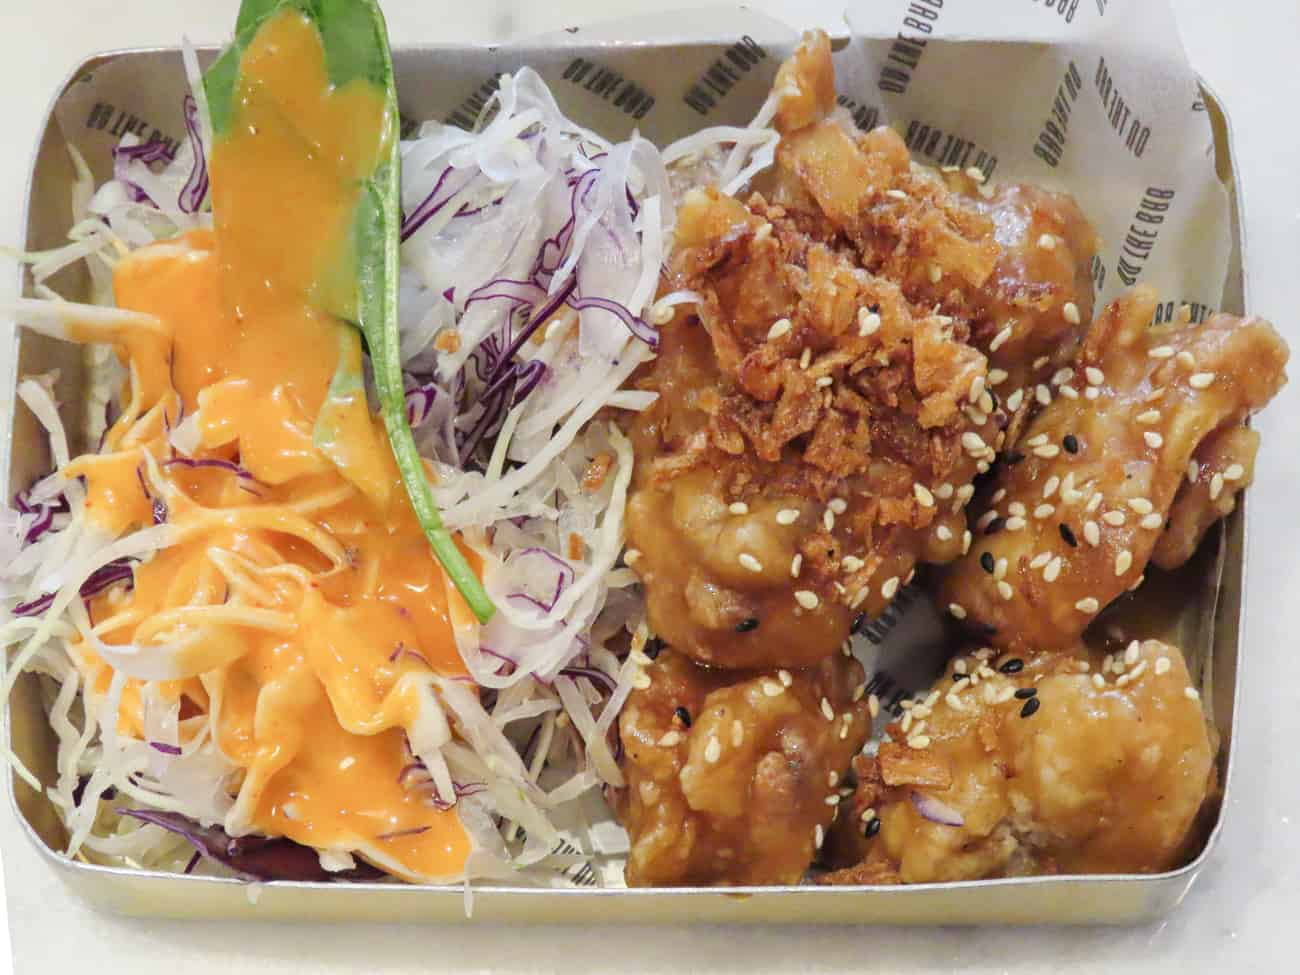 on-the-bab-paris-street-food-coreen-restaurant-3